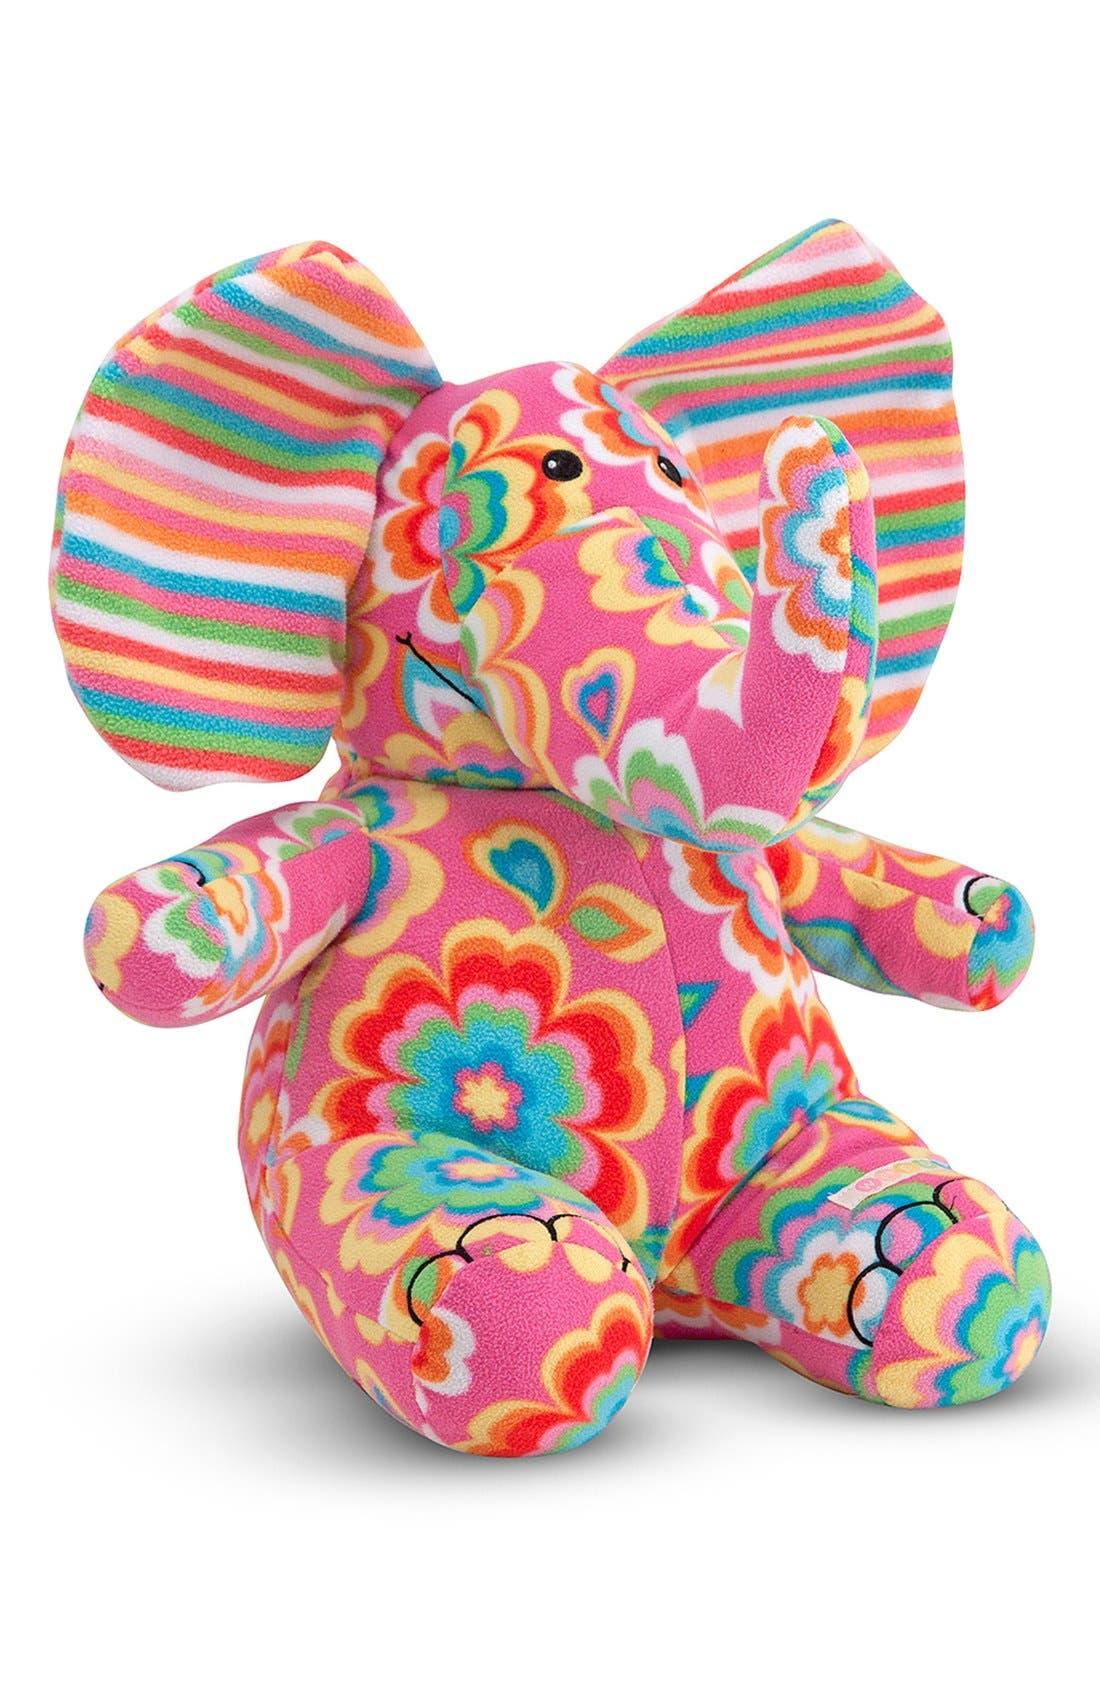 'Beeposh - Sally Elephant' Plush Toy,                             Main thumbnail 1, color,                             Pink